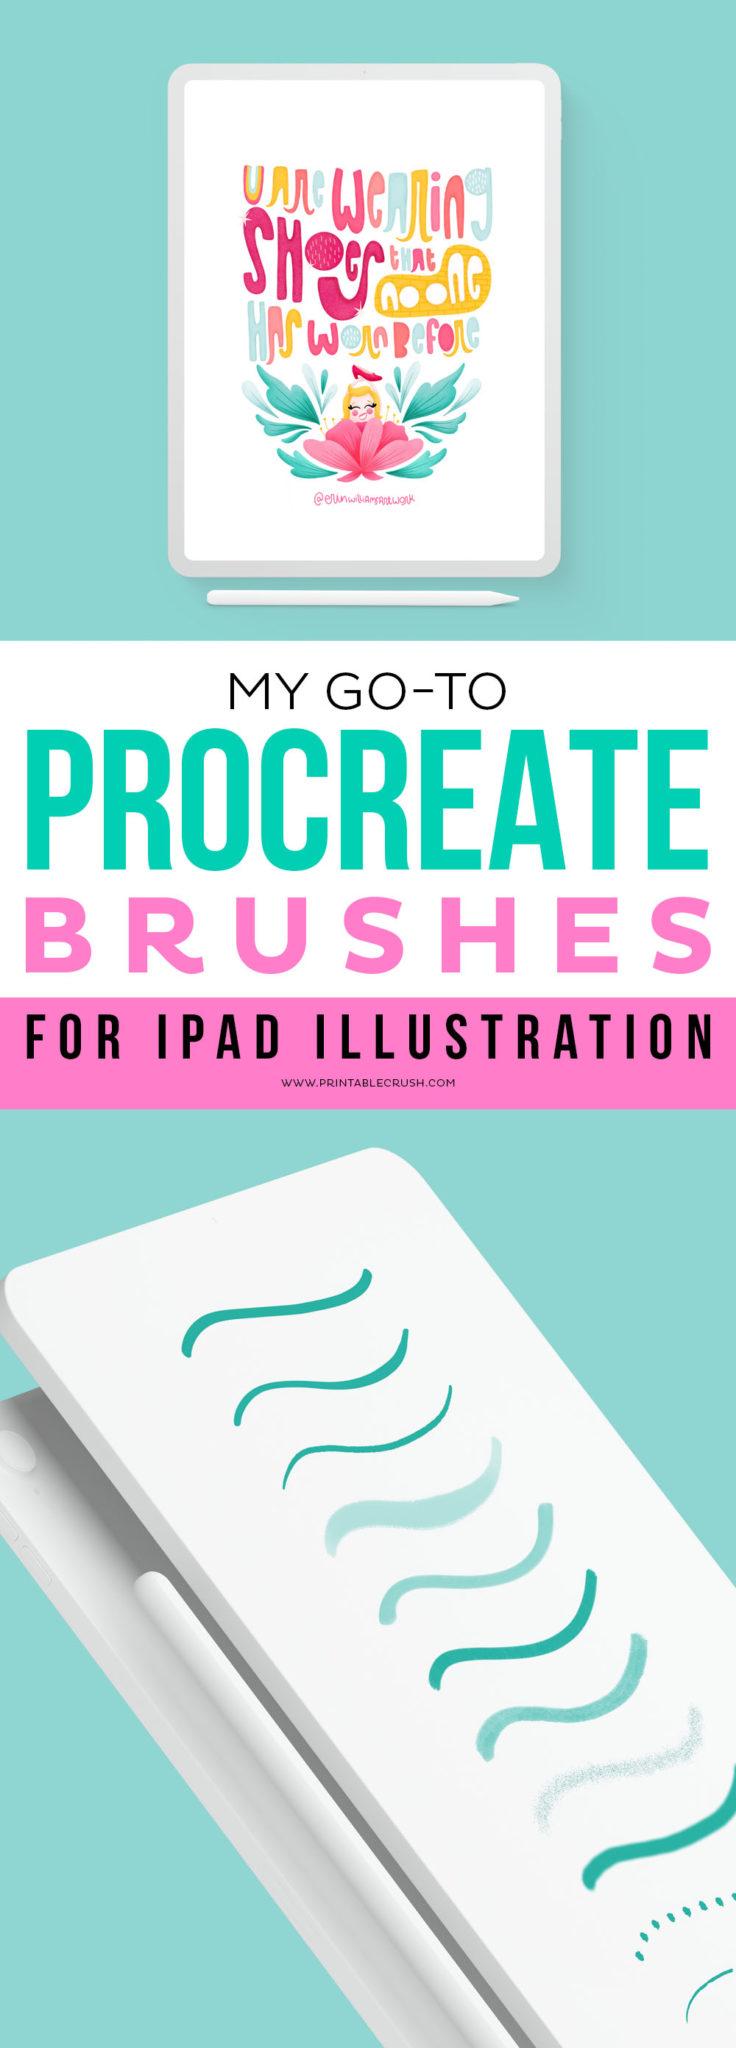 Top Procreate Brushes for iPad Illustration - Creative Market Brushes #ipadillustration #erinwilliamsartwork #ipaddrawings #procreateapp #procreate #procreatebrushes via @printablecrush